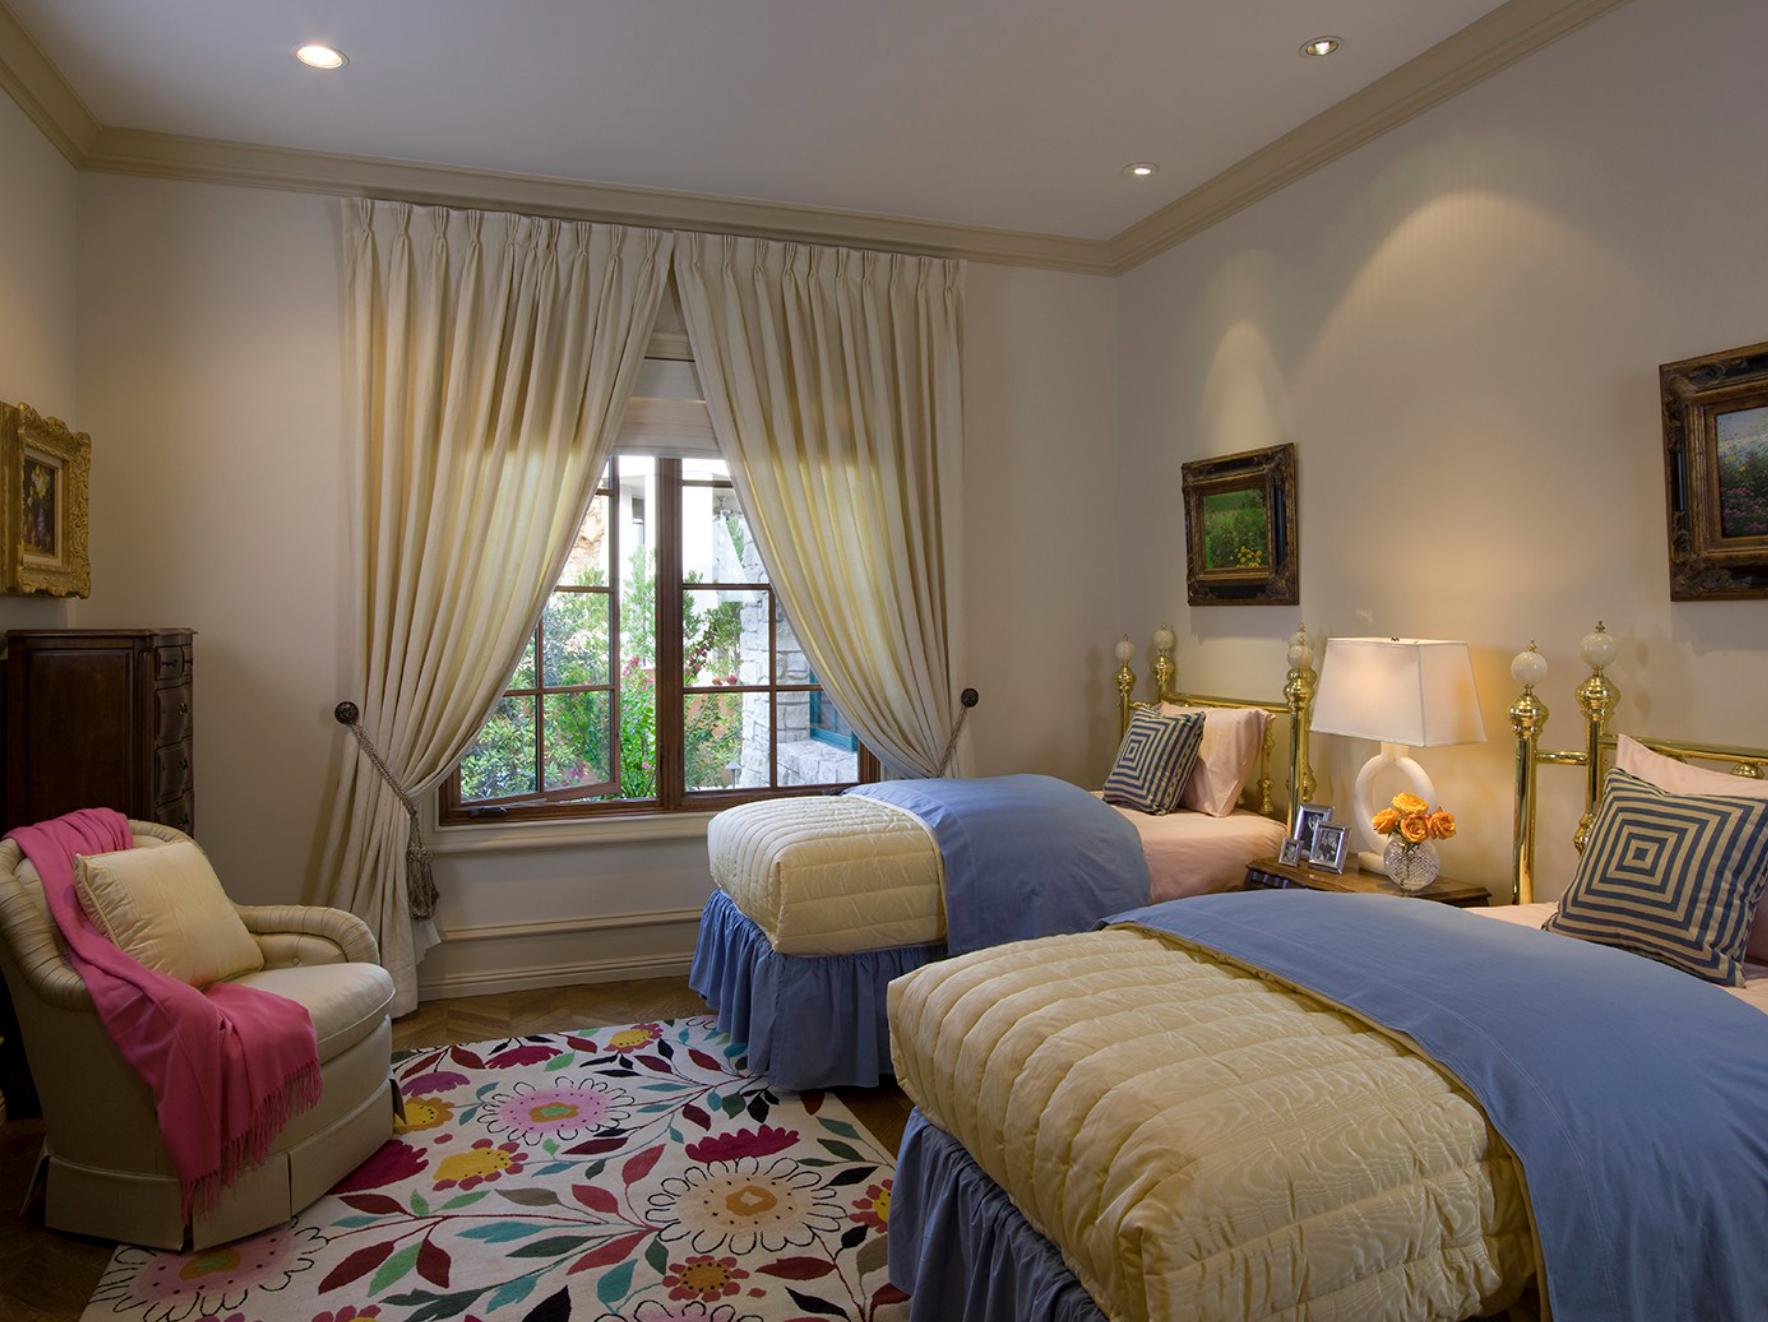 Traditional Home Girls Bedroom Floral Rug